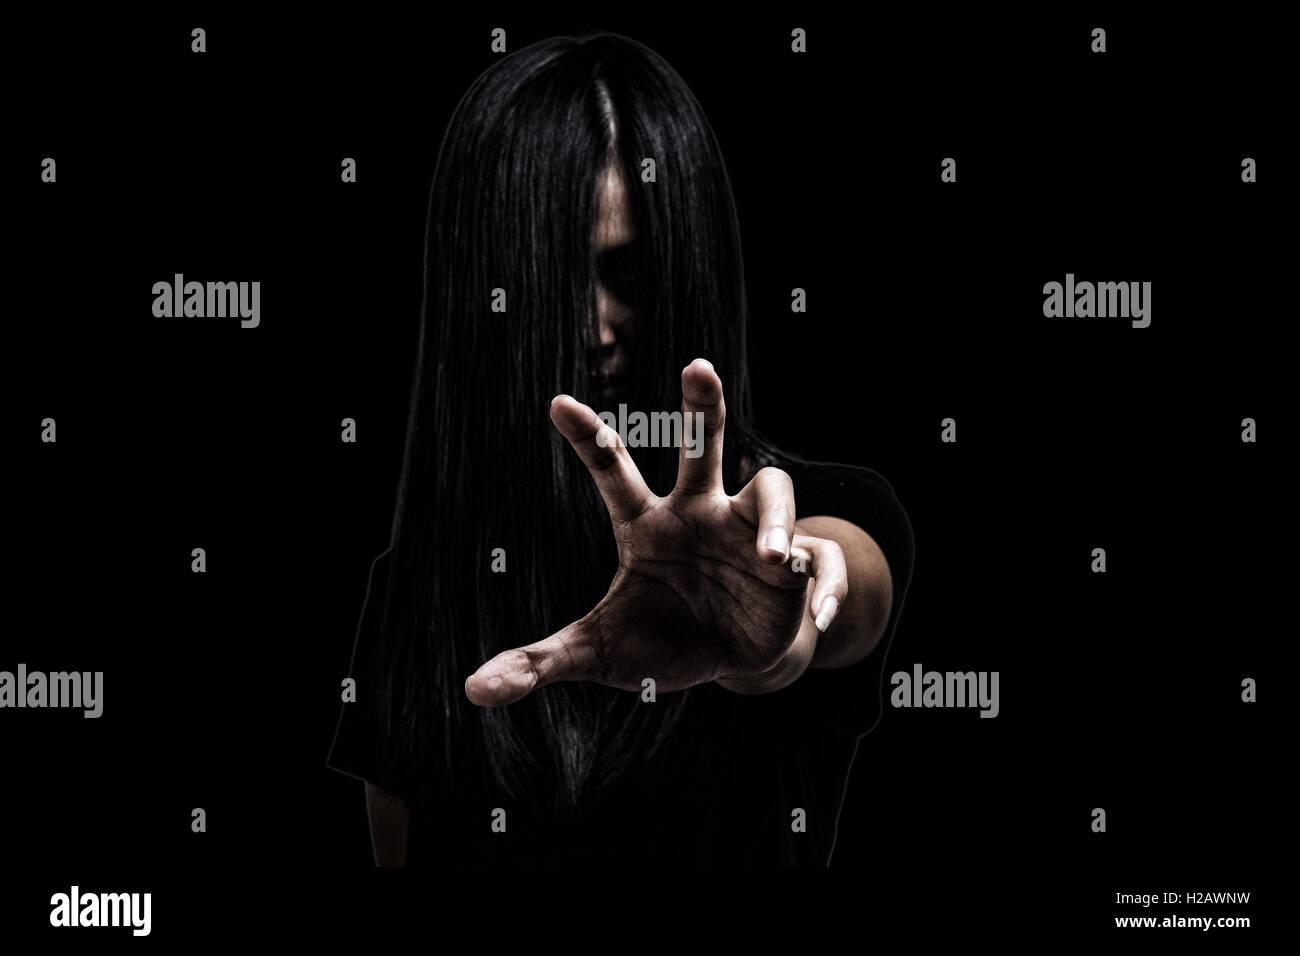 Geist, Horror, Frau, Gesicht, Mädchen, böse, Dämon, dunkel, Halloween, grausam, schmutzig, gruselig, Stockbild